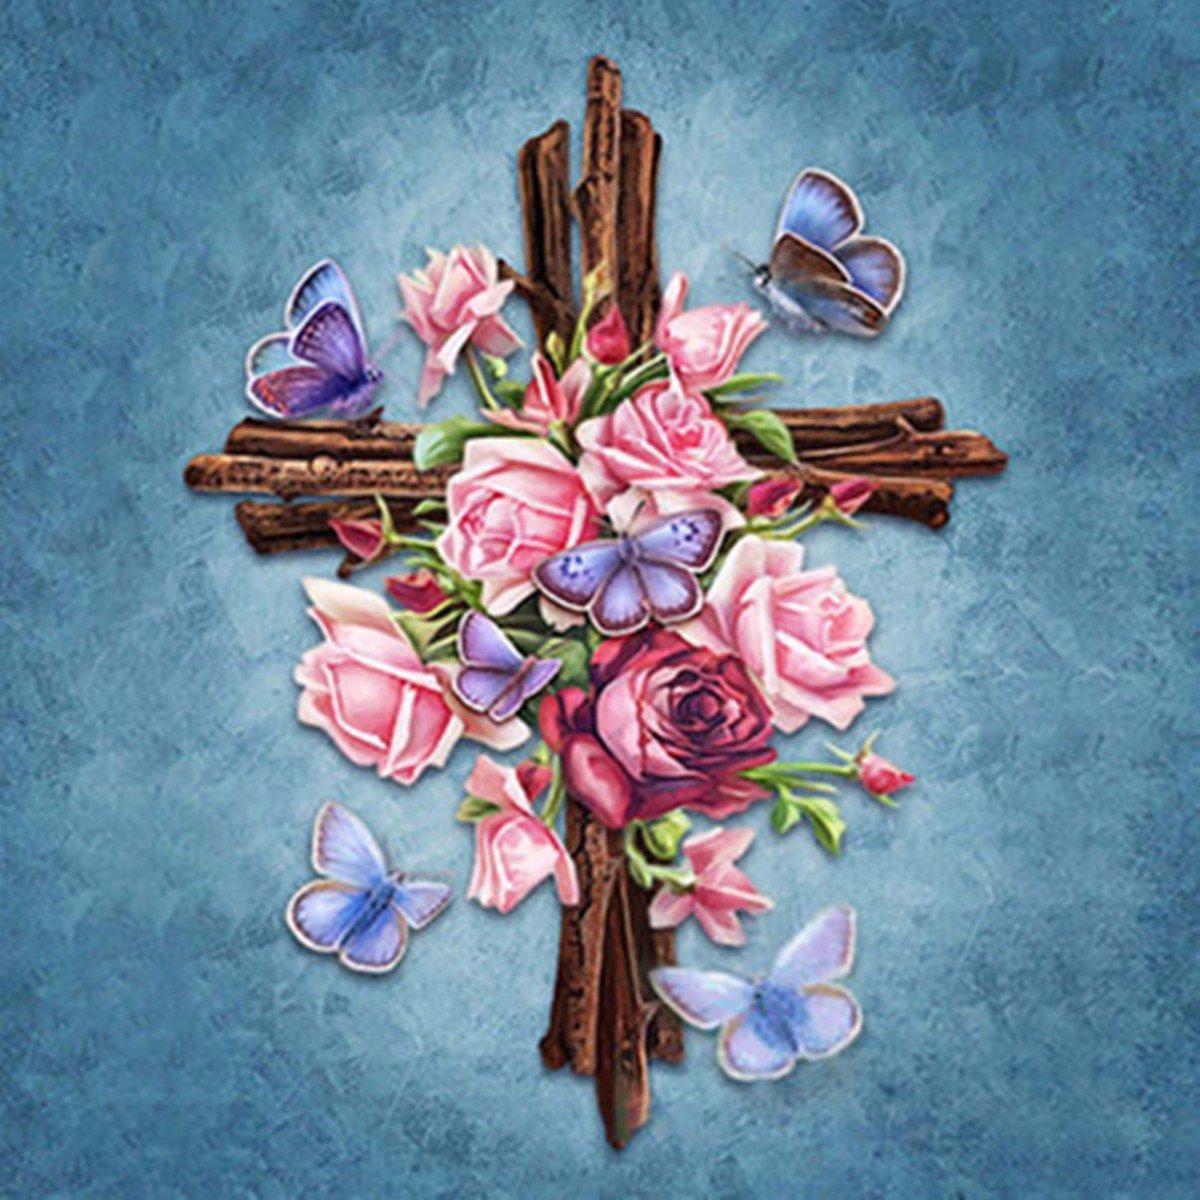 Religious Cross Diamond Embroidery 5D Diamond DIY Painting Cross Stitch Living Room Home Decor